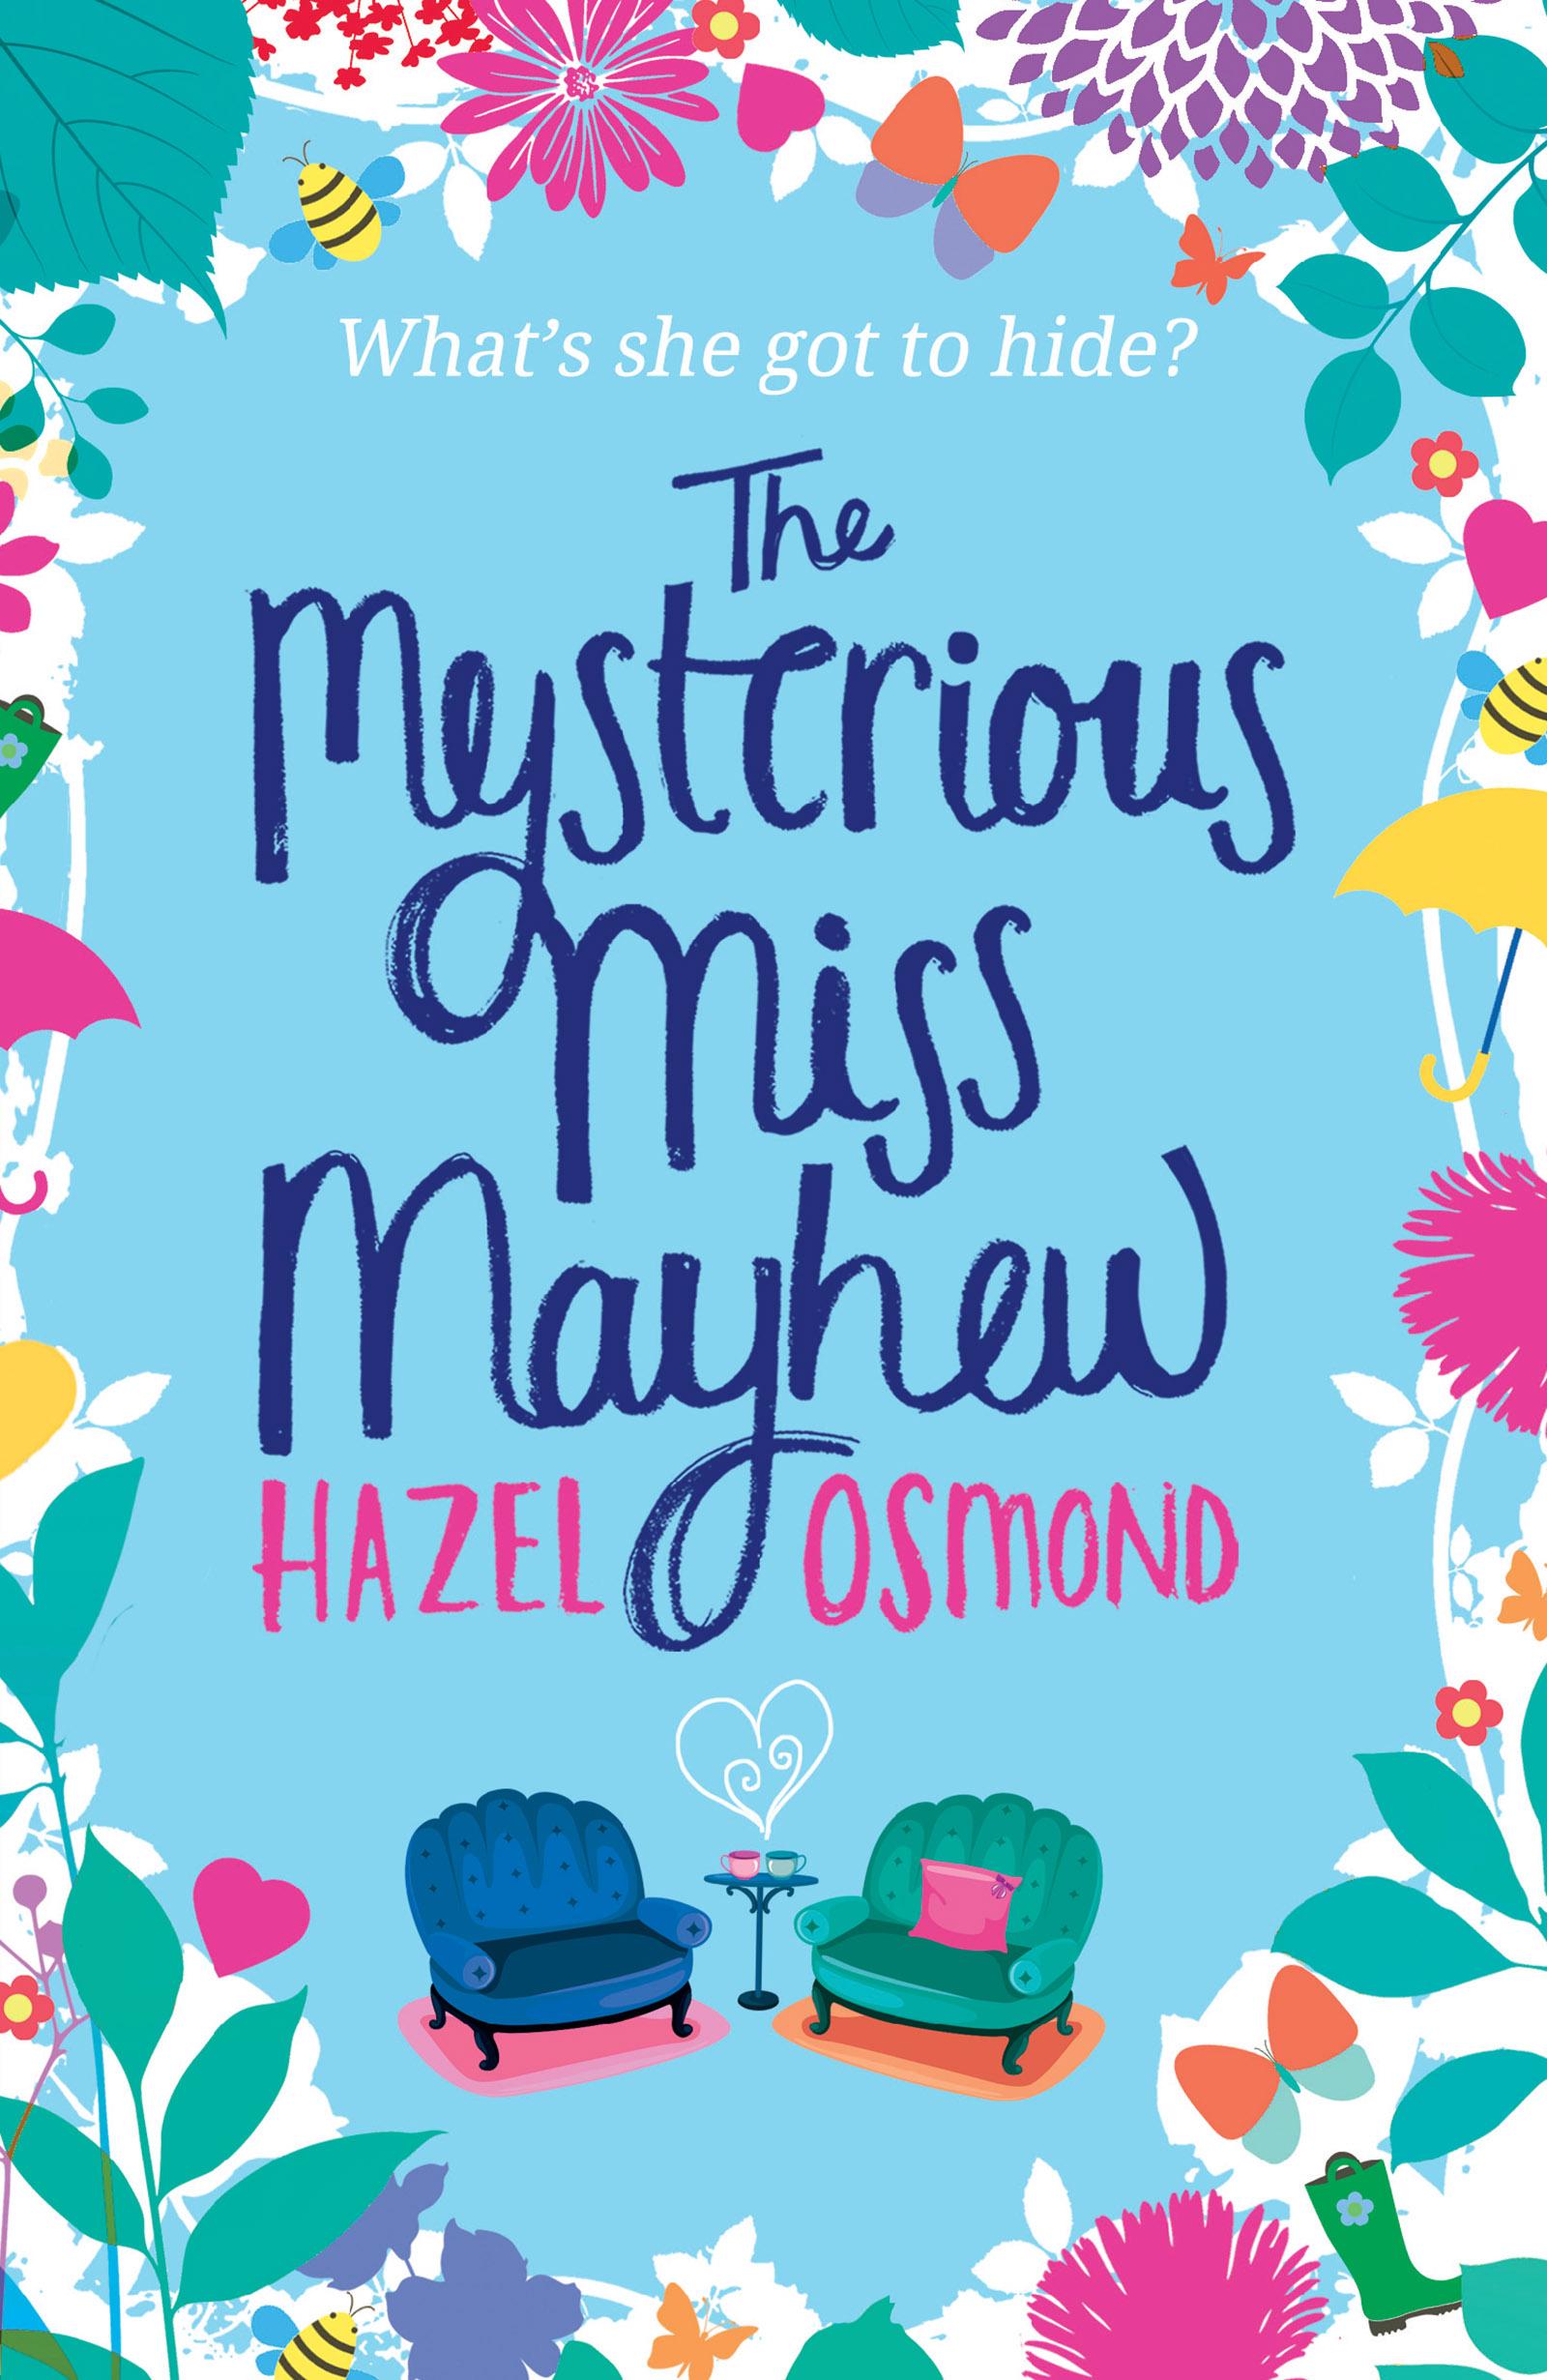 Hazel Osmond cover